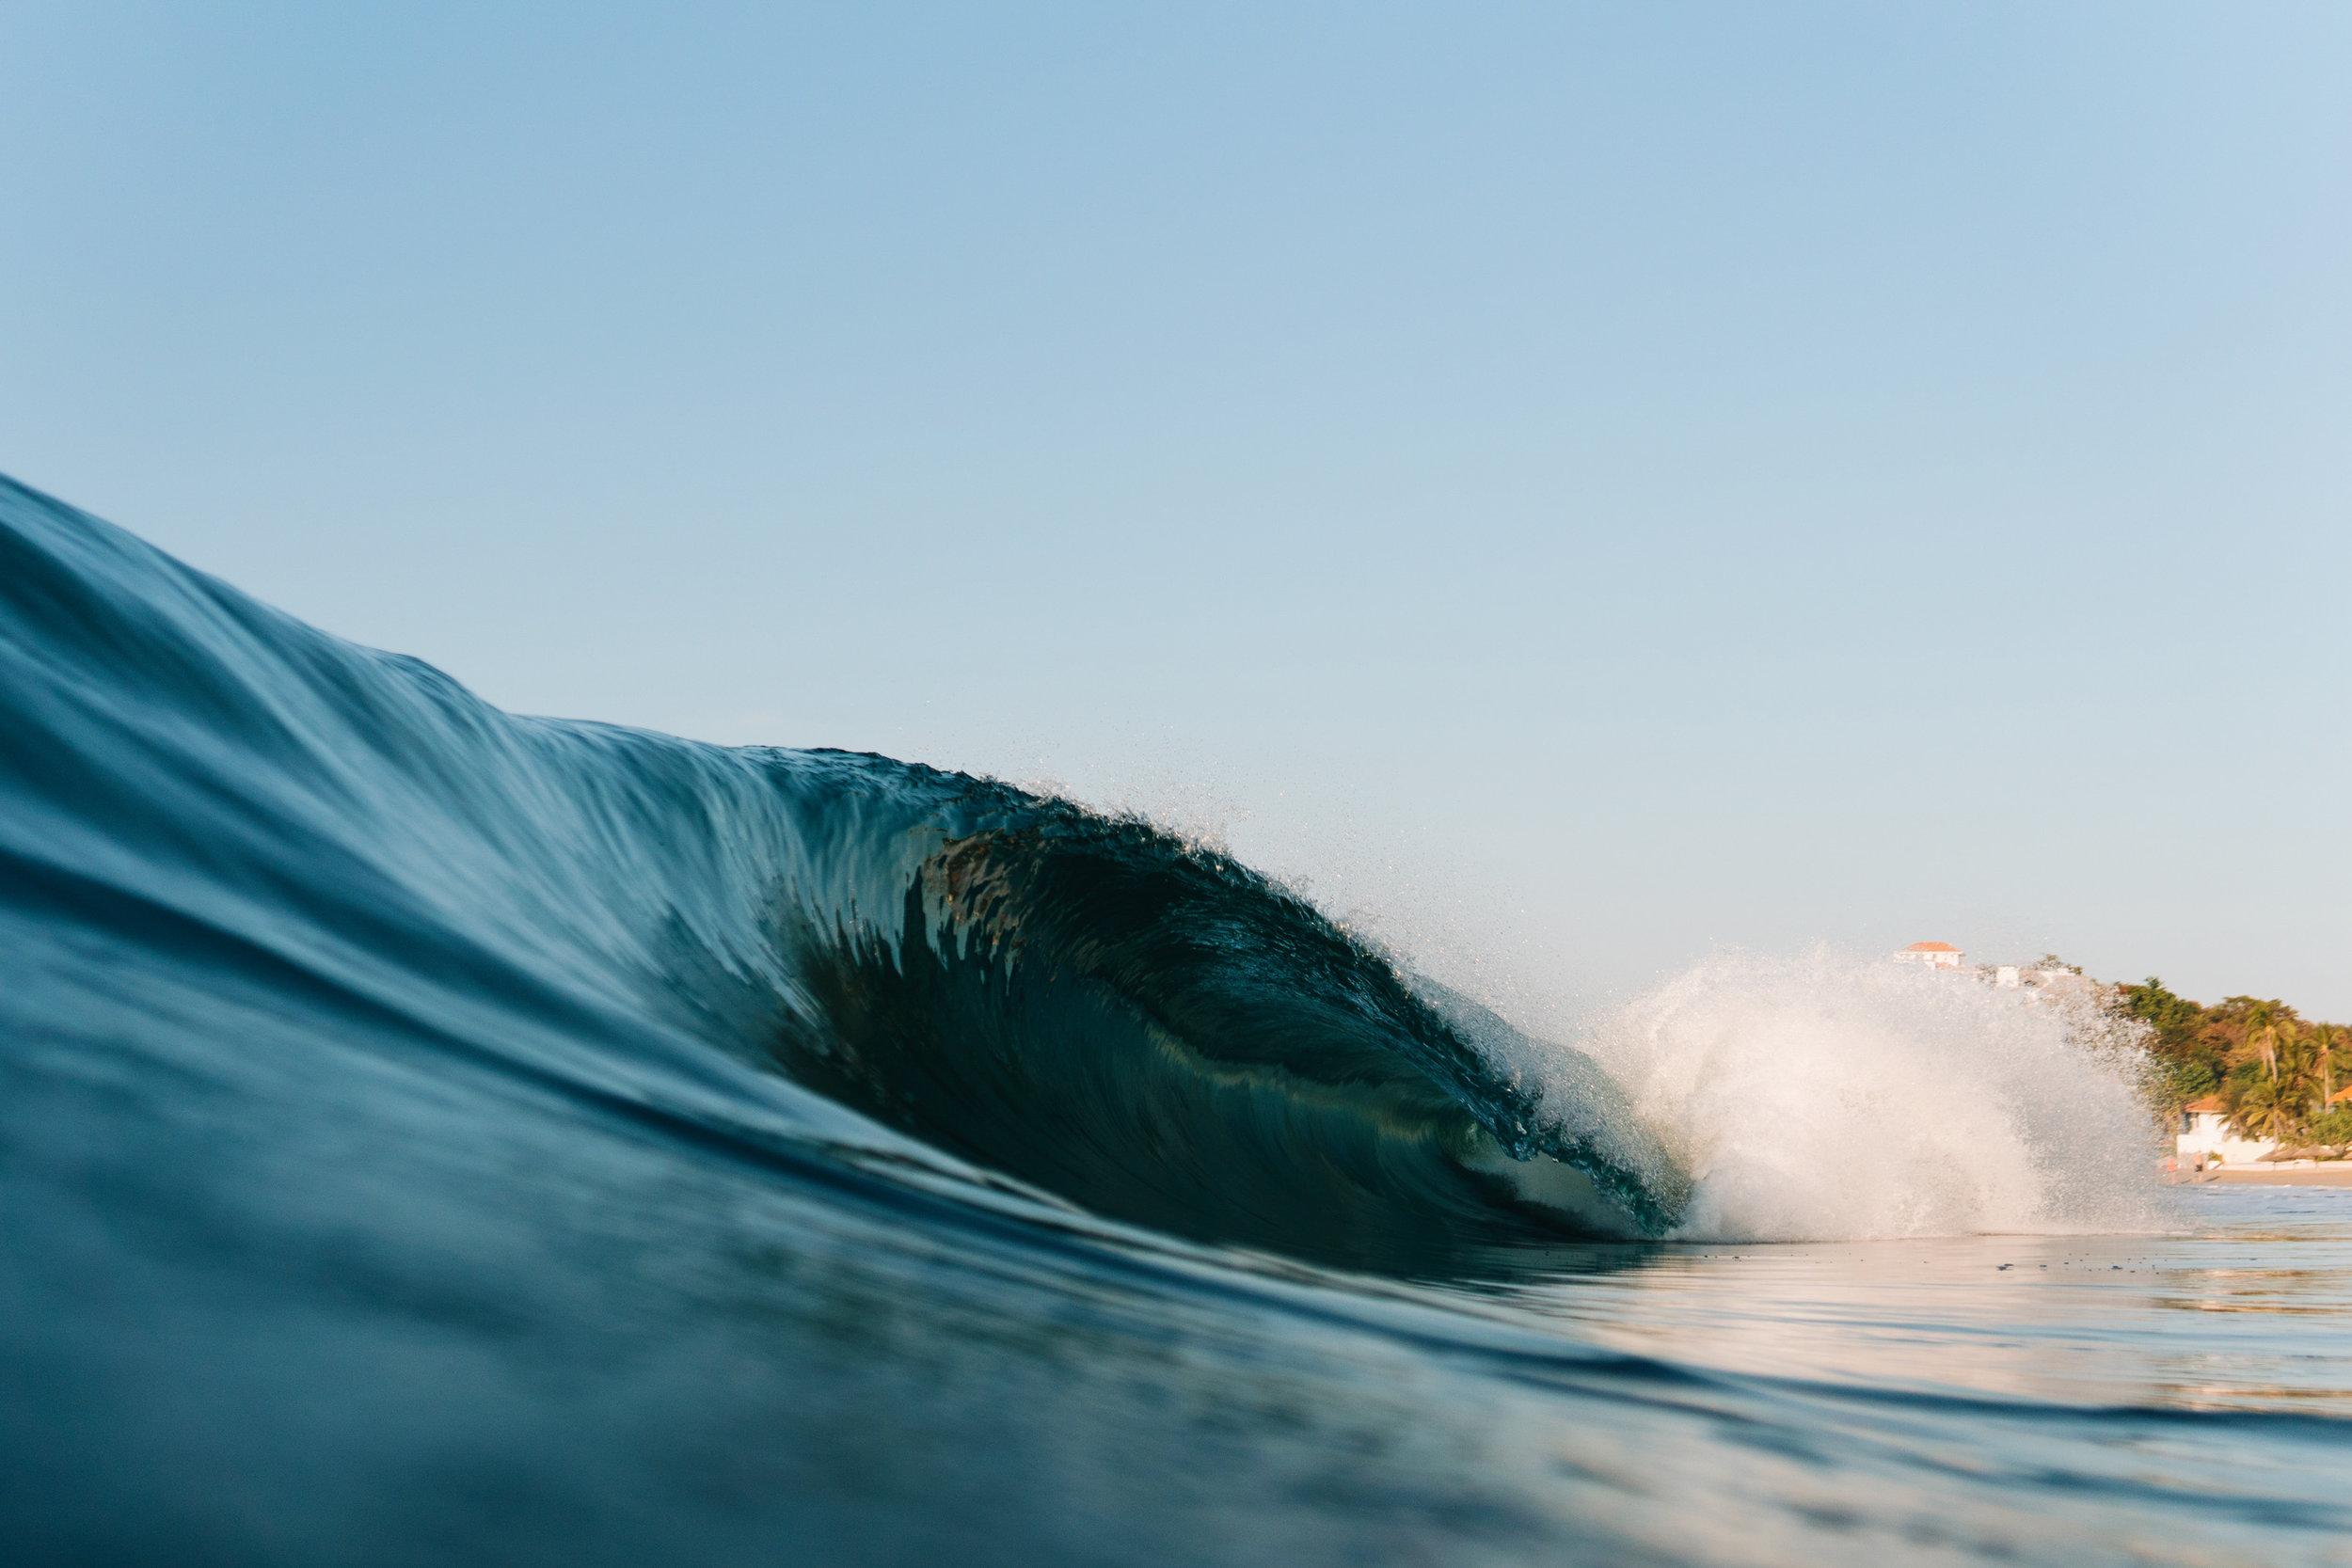 Surf-Mexico-Zihuatanejo-Sayulita-Ixtapa-Zihuatanejo-Diego-Cadena-Olas-Fotografia-Heiko-Bothe-46.jpg